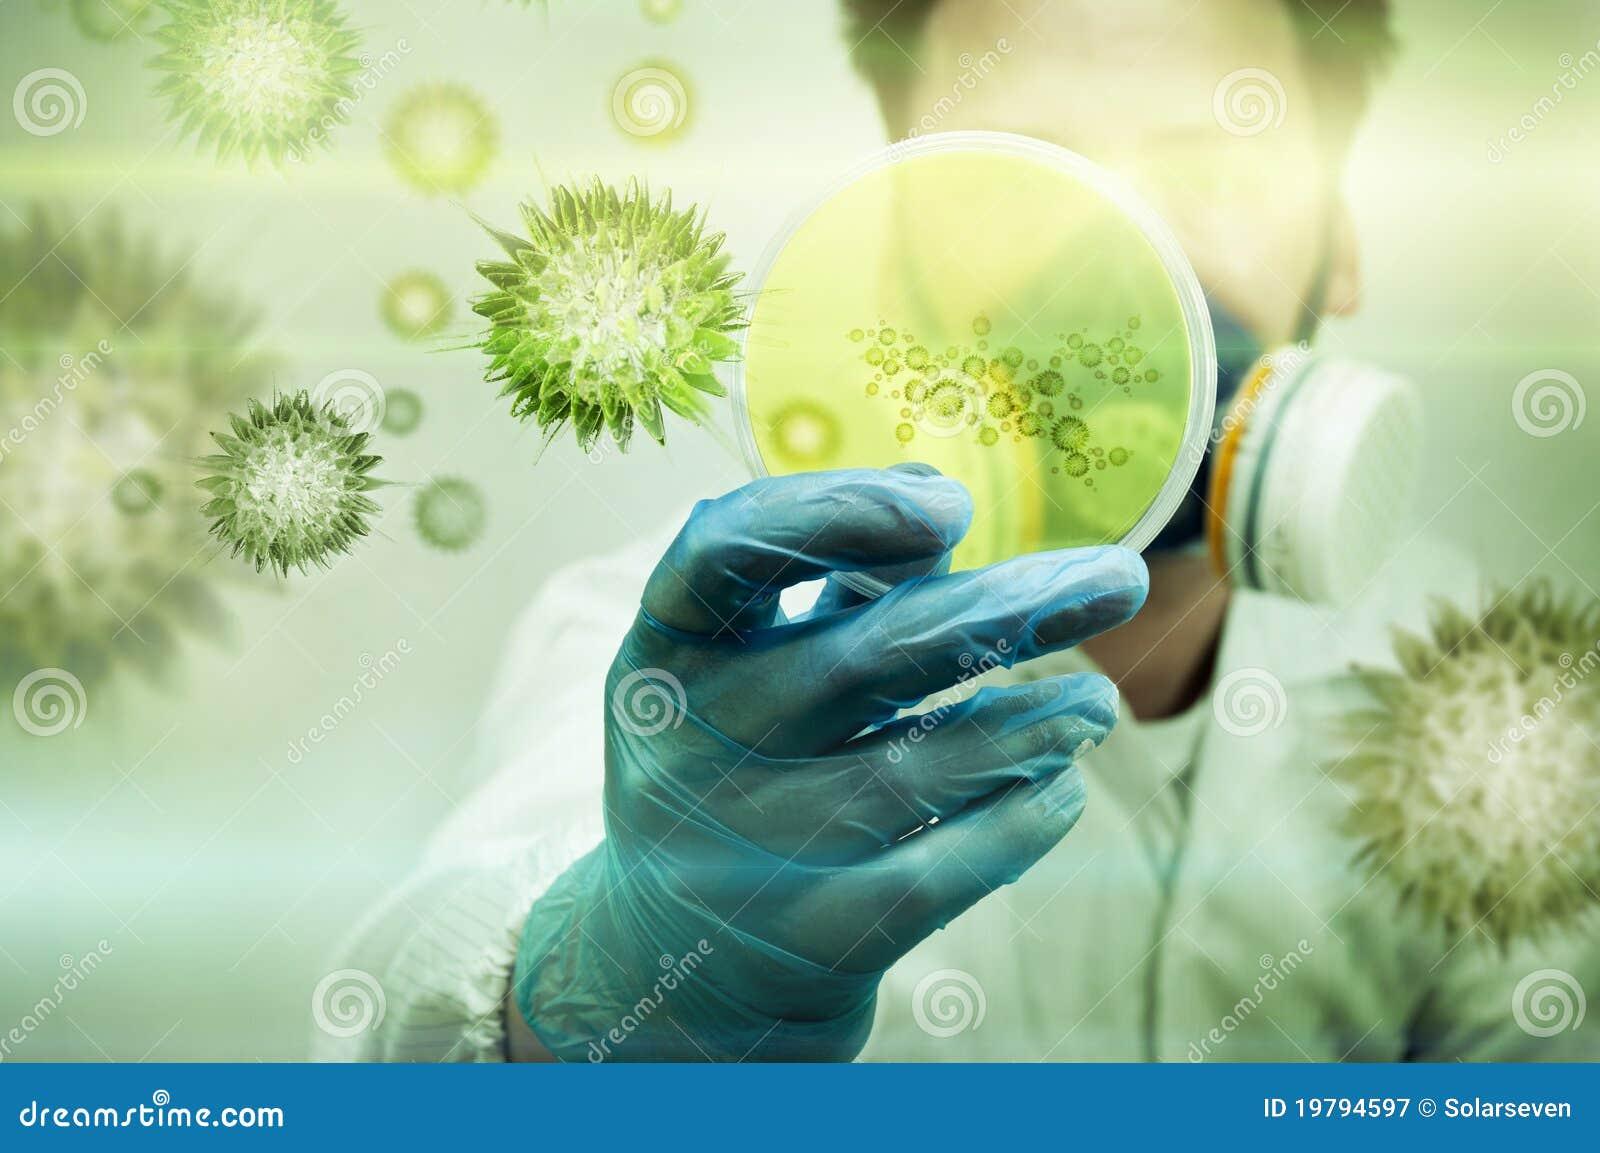 Vetenskaperna om olika organismers beskaffenhet